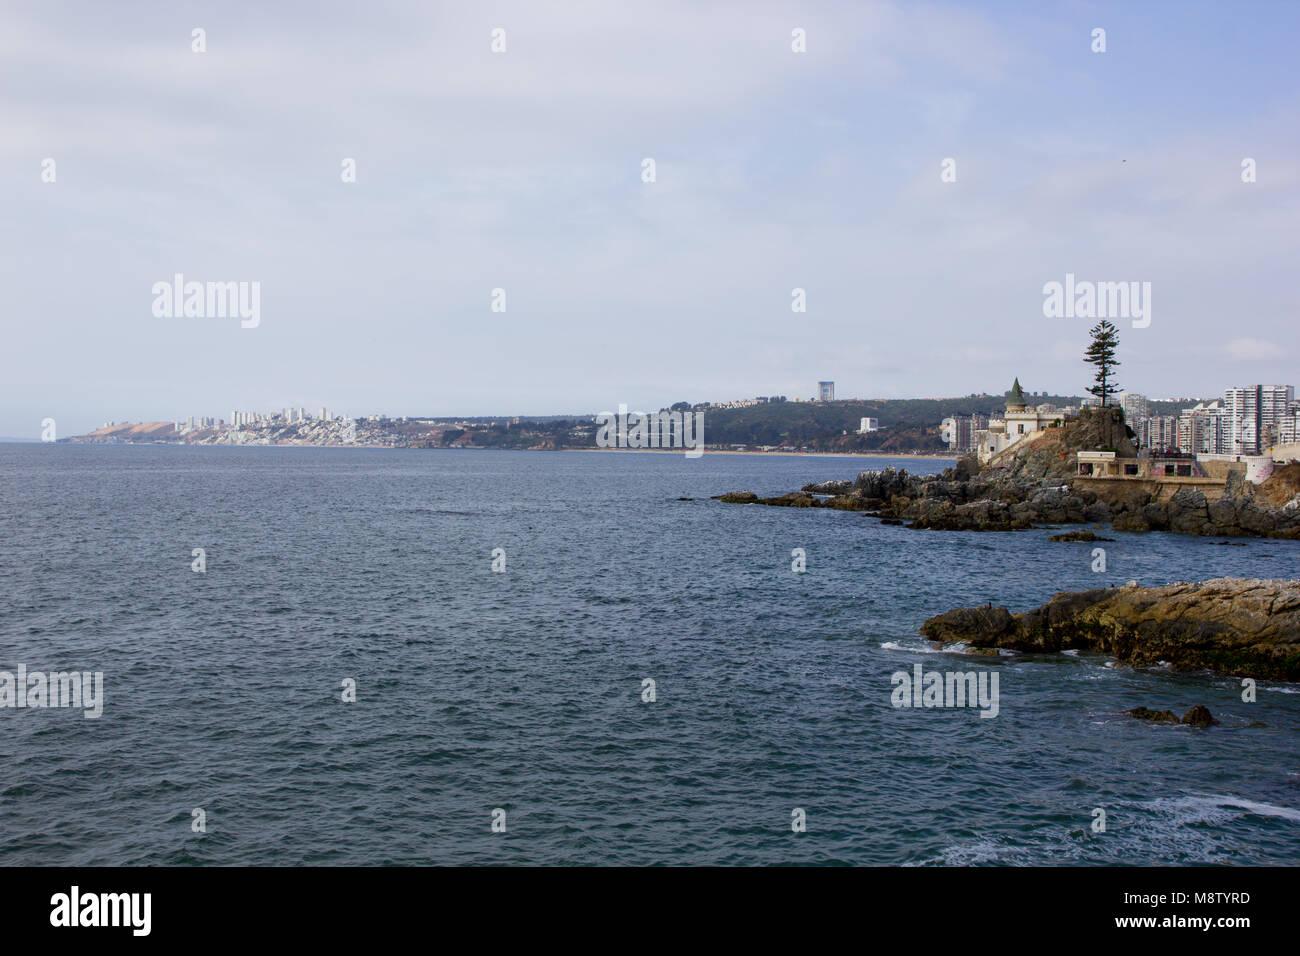 Coastline view in Vina del Mar, Chile in South America - Stock Image